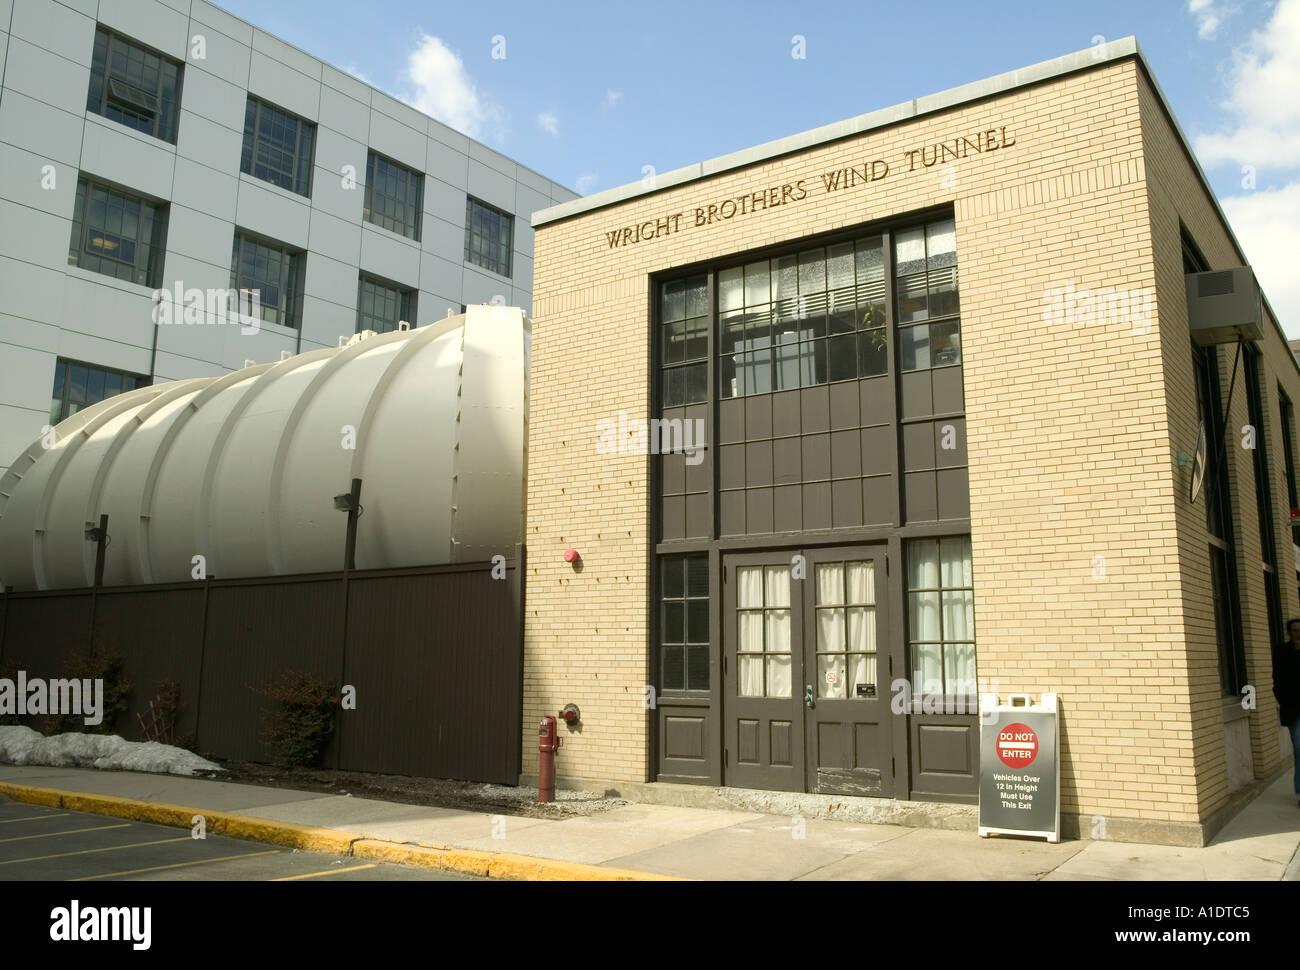 Wright Brothers Wind Tunnel Massachusetts Institute of technology MIT Cambridge MA Stock Photo